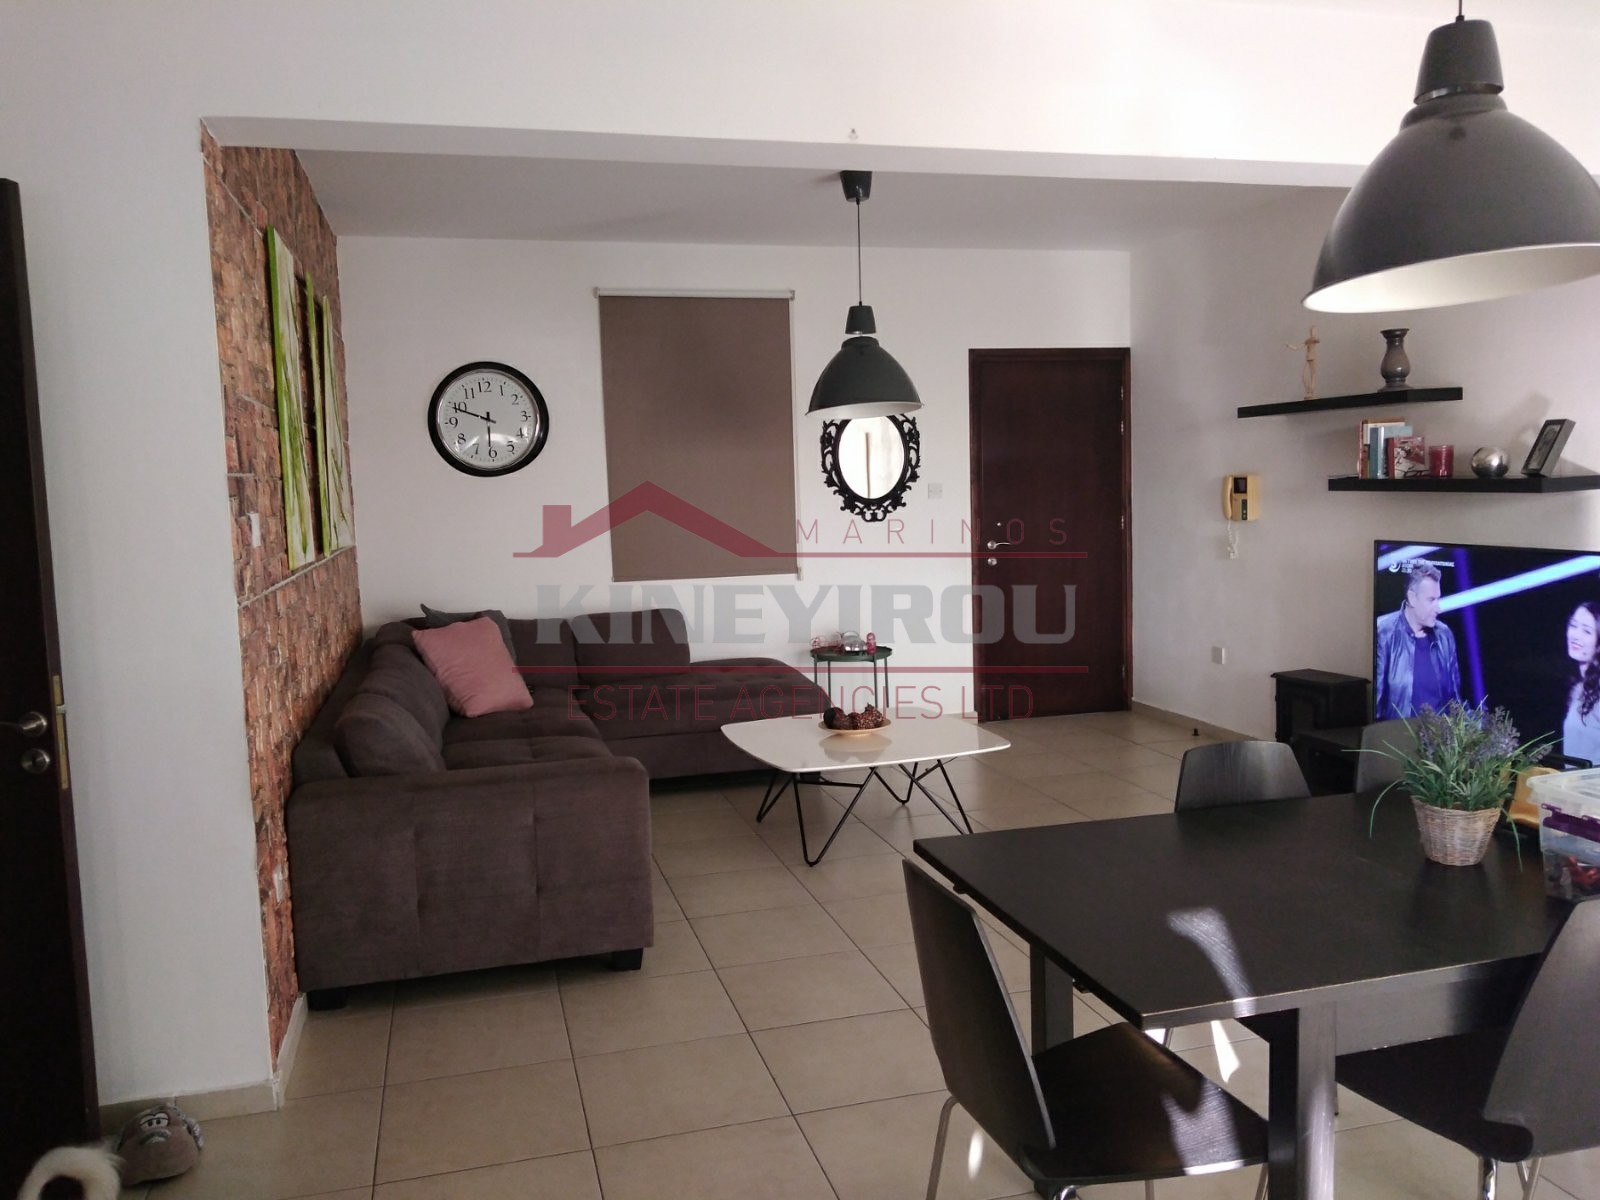 2 Bedroom Apartment in Krasa area, Larnaca